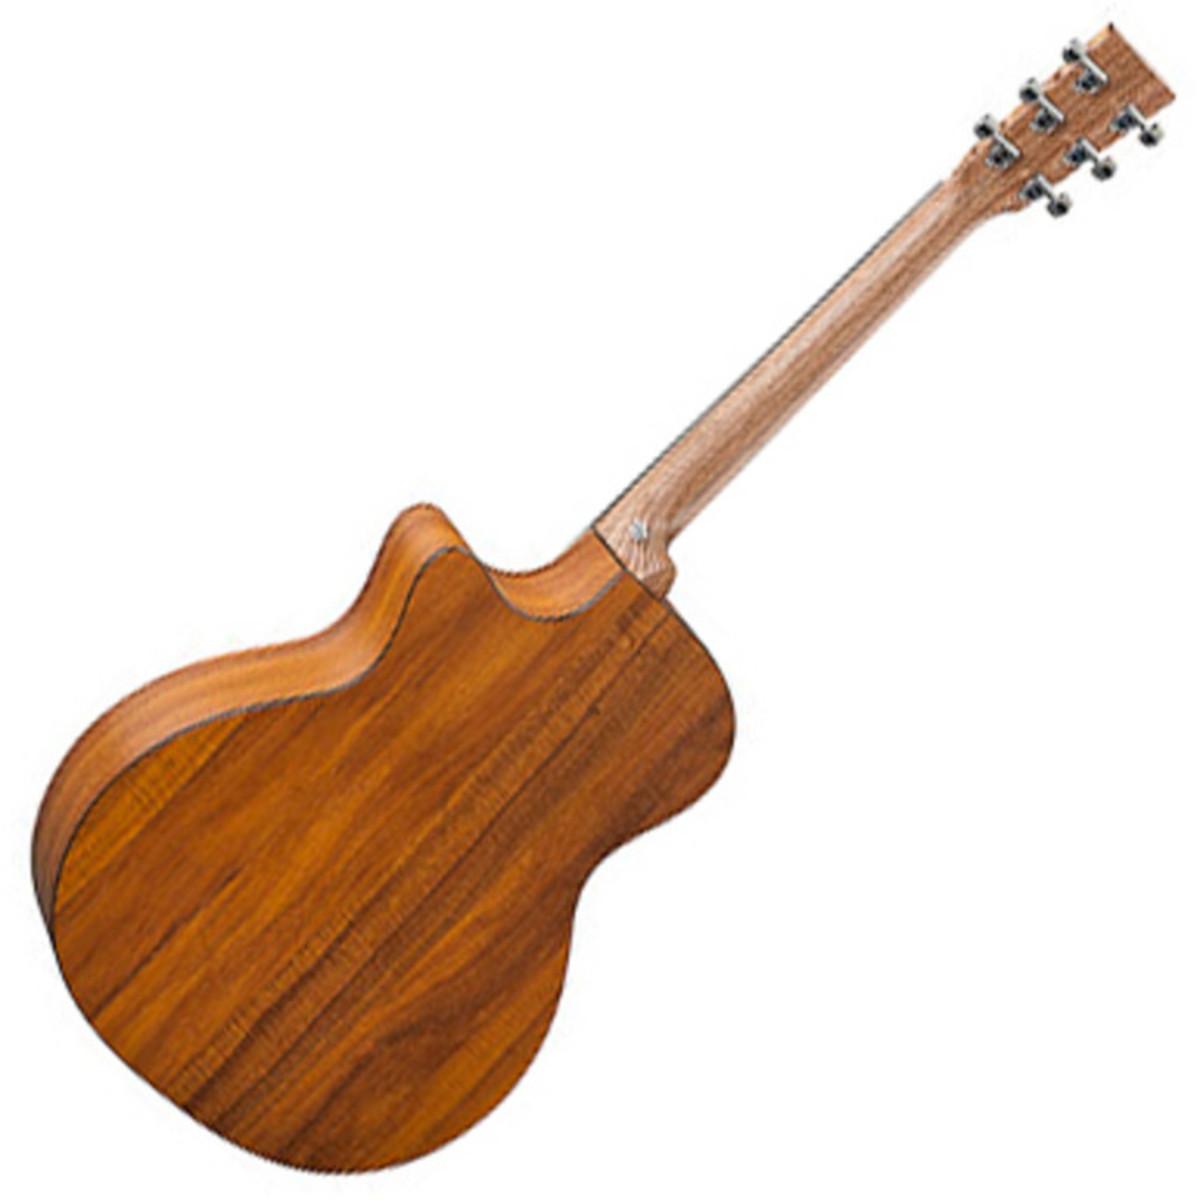 martin gpcpa5k guitare electro acoustique ex d mo. Black Bedroom Furniture Sets. Home Design Ideas